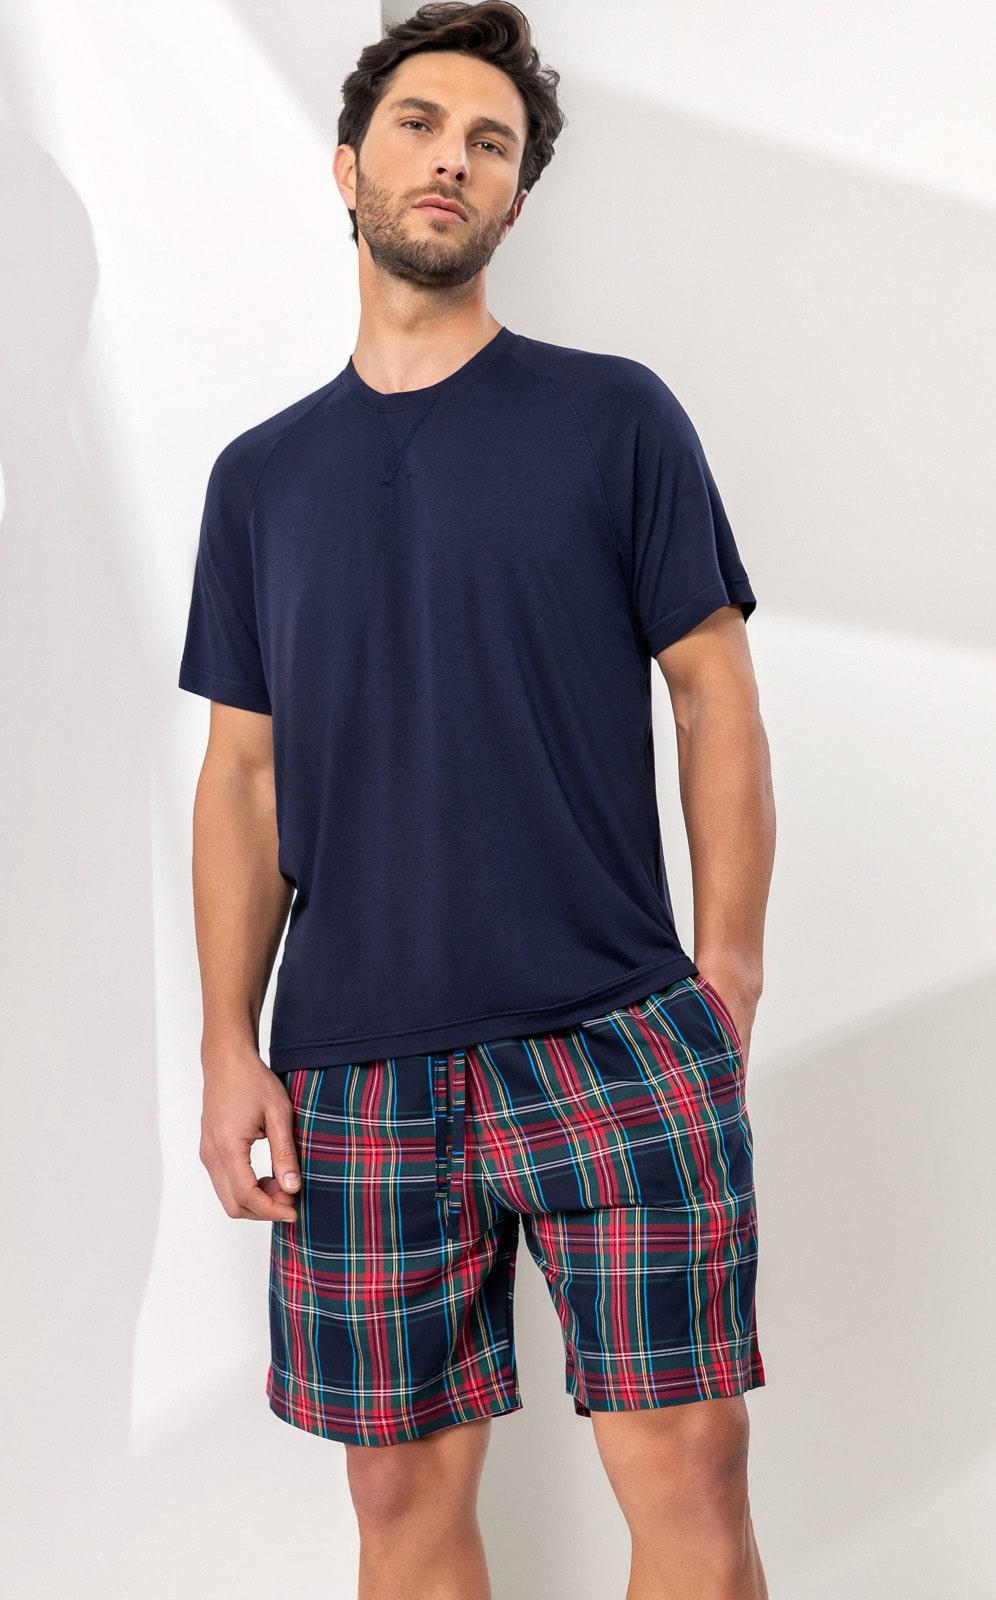 Pijama Masculino Mixte Manga Curta com Bermuda Xadrez 1204